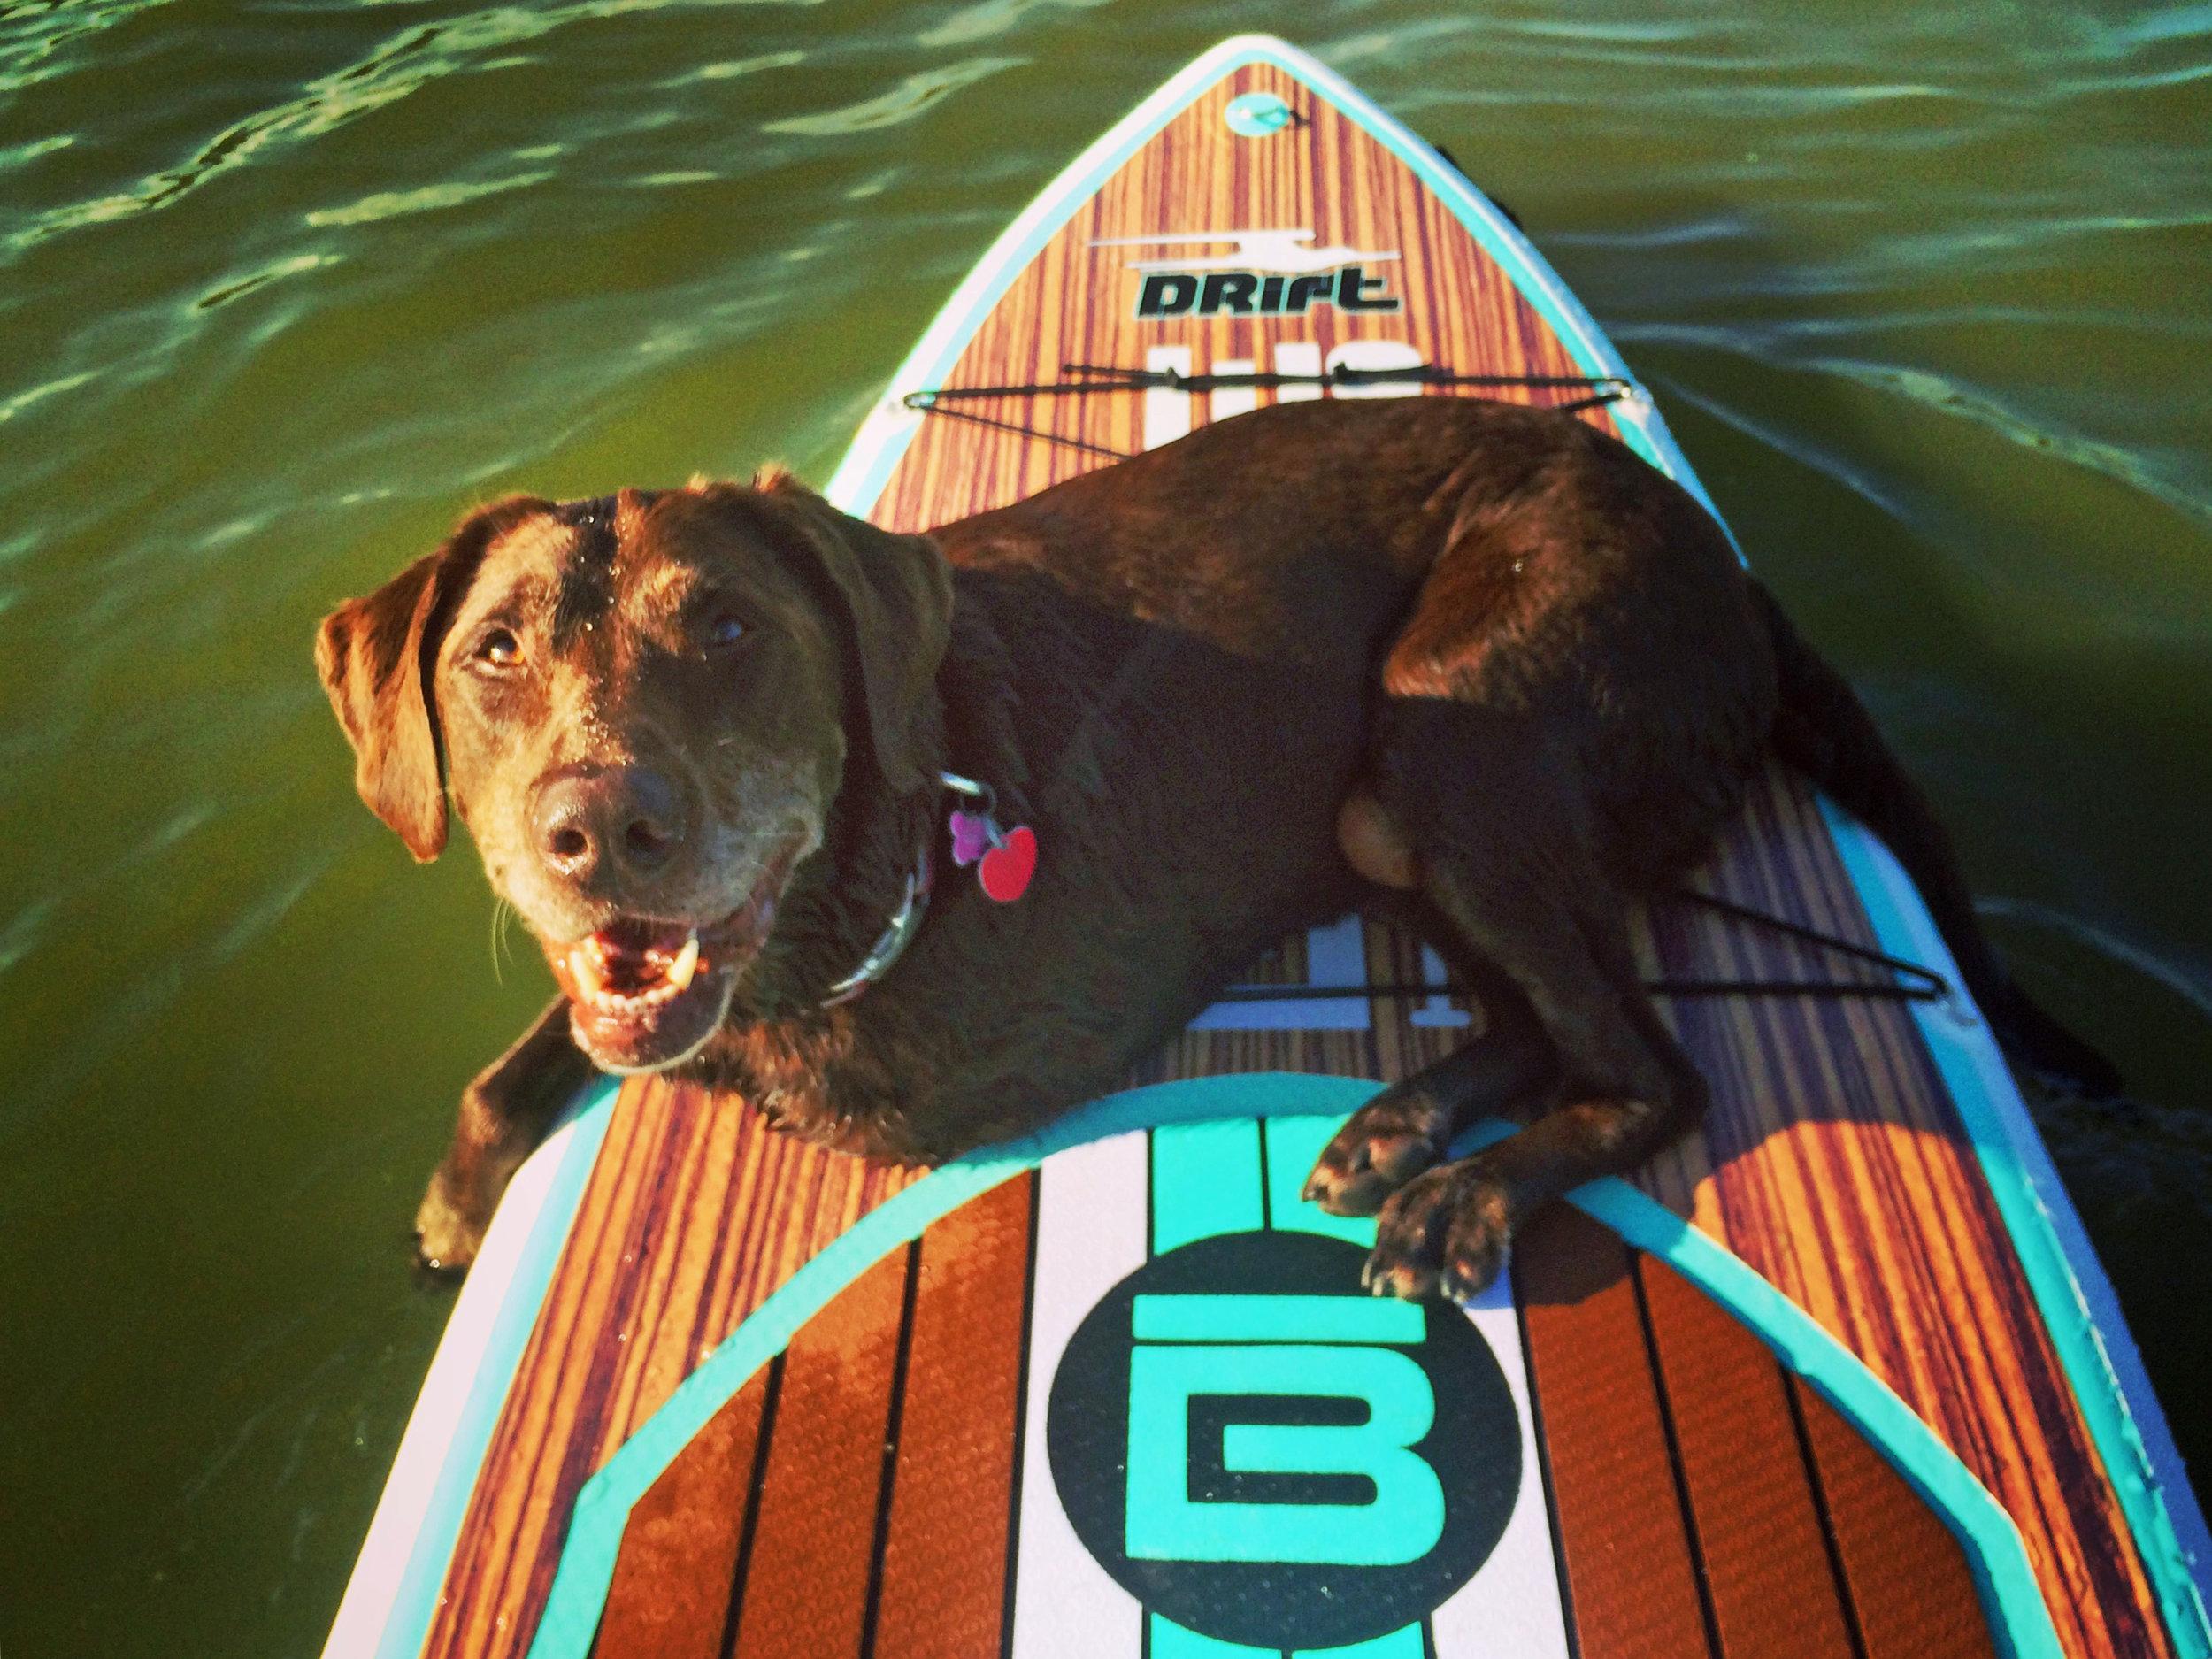 Bella enjoyed riding the paddle board.